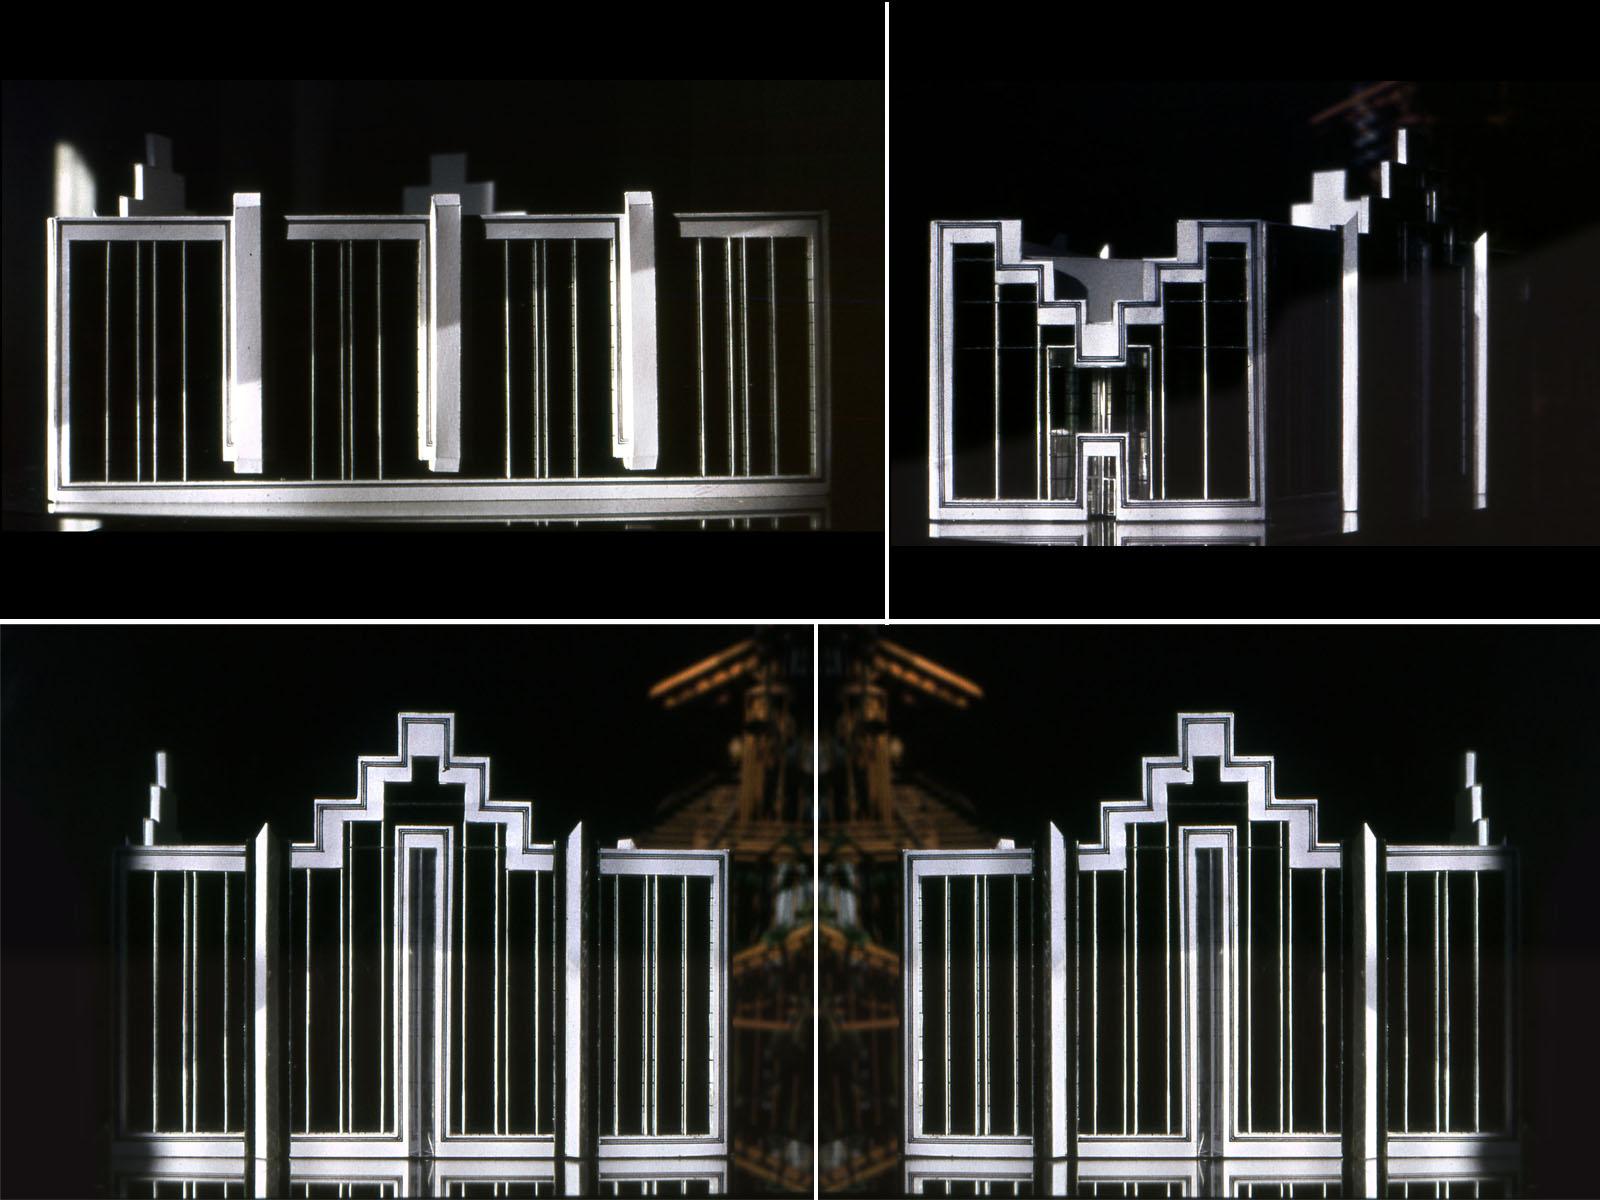 danielvillalobos-architecturexxthcentury-spanisharchitecture-schoolarchitectureproject-18.2